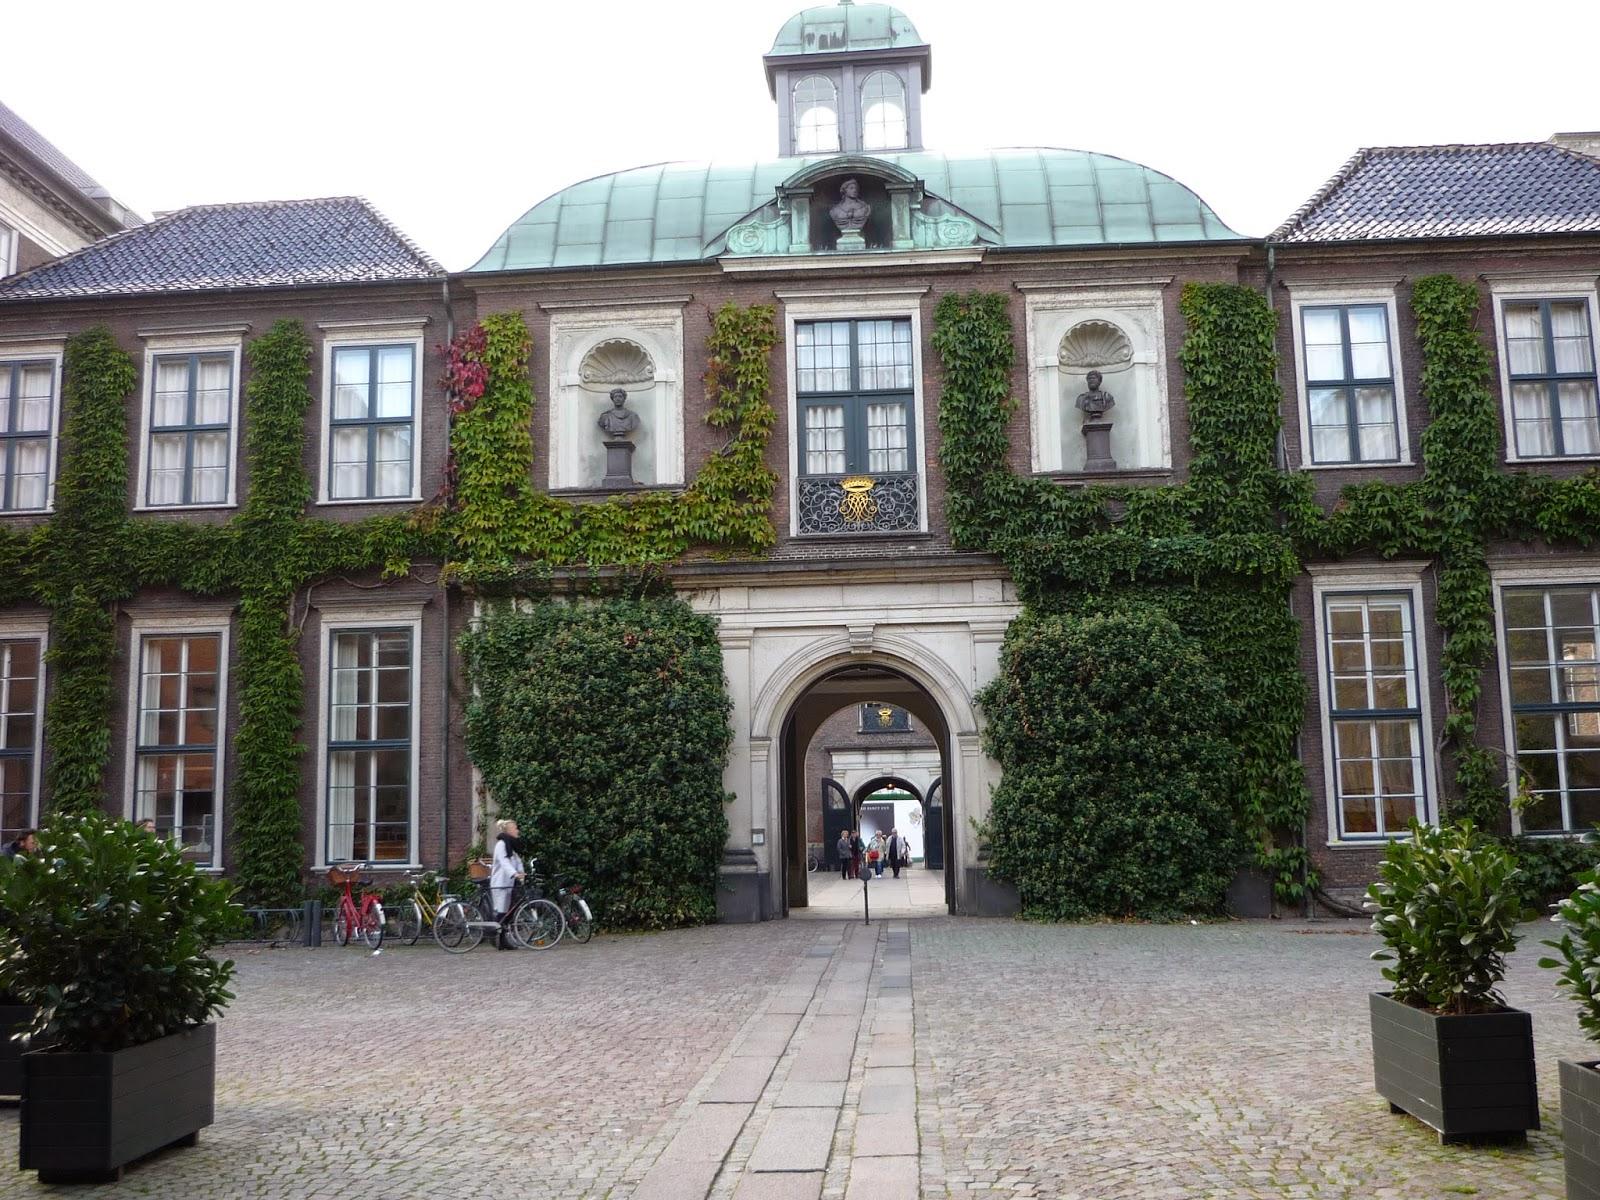 Kunsthal Charlottenborg/